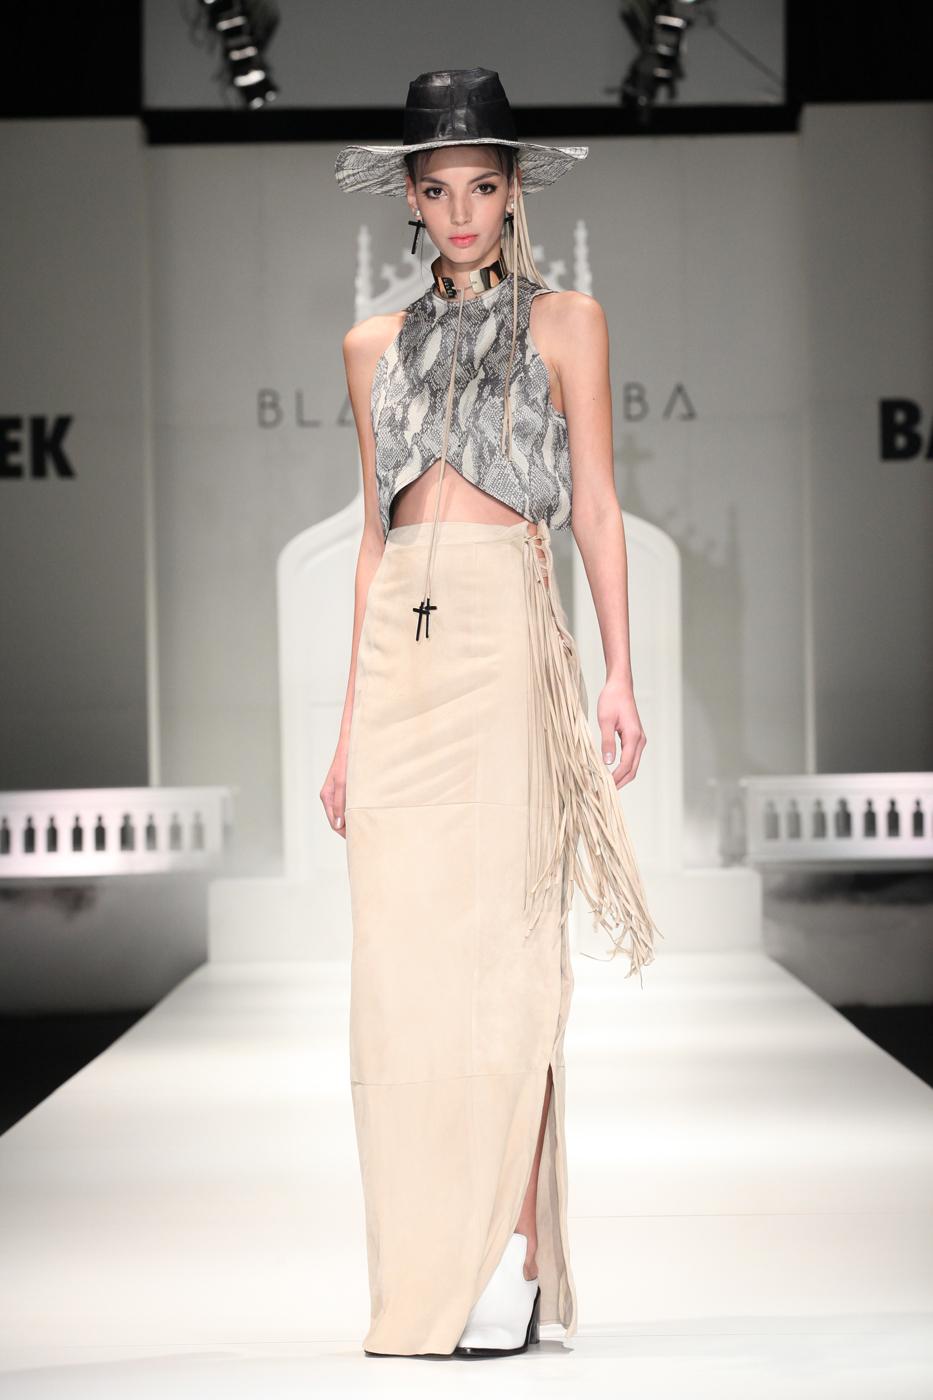 blackmamba-bafweek-fashion-diaries